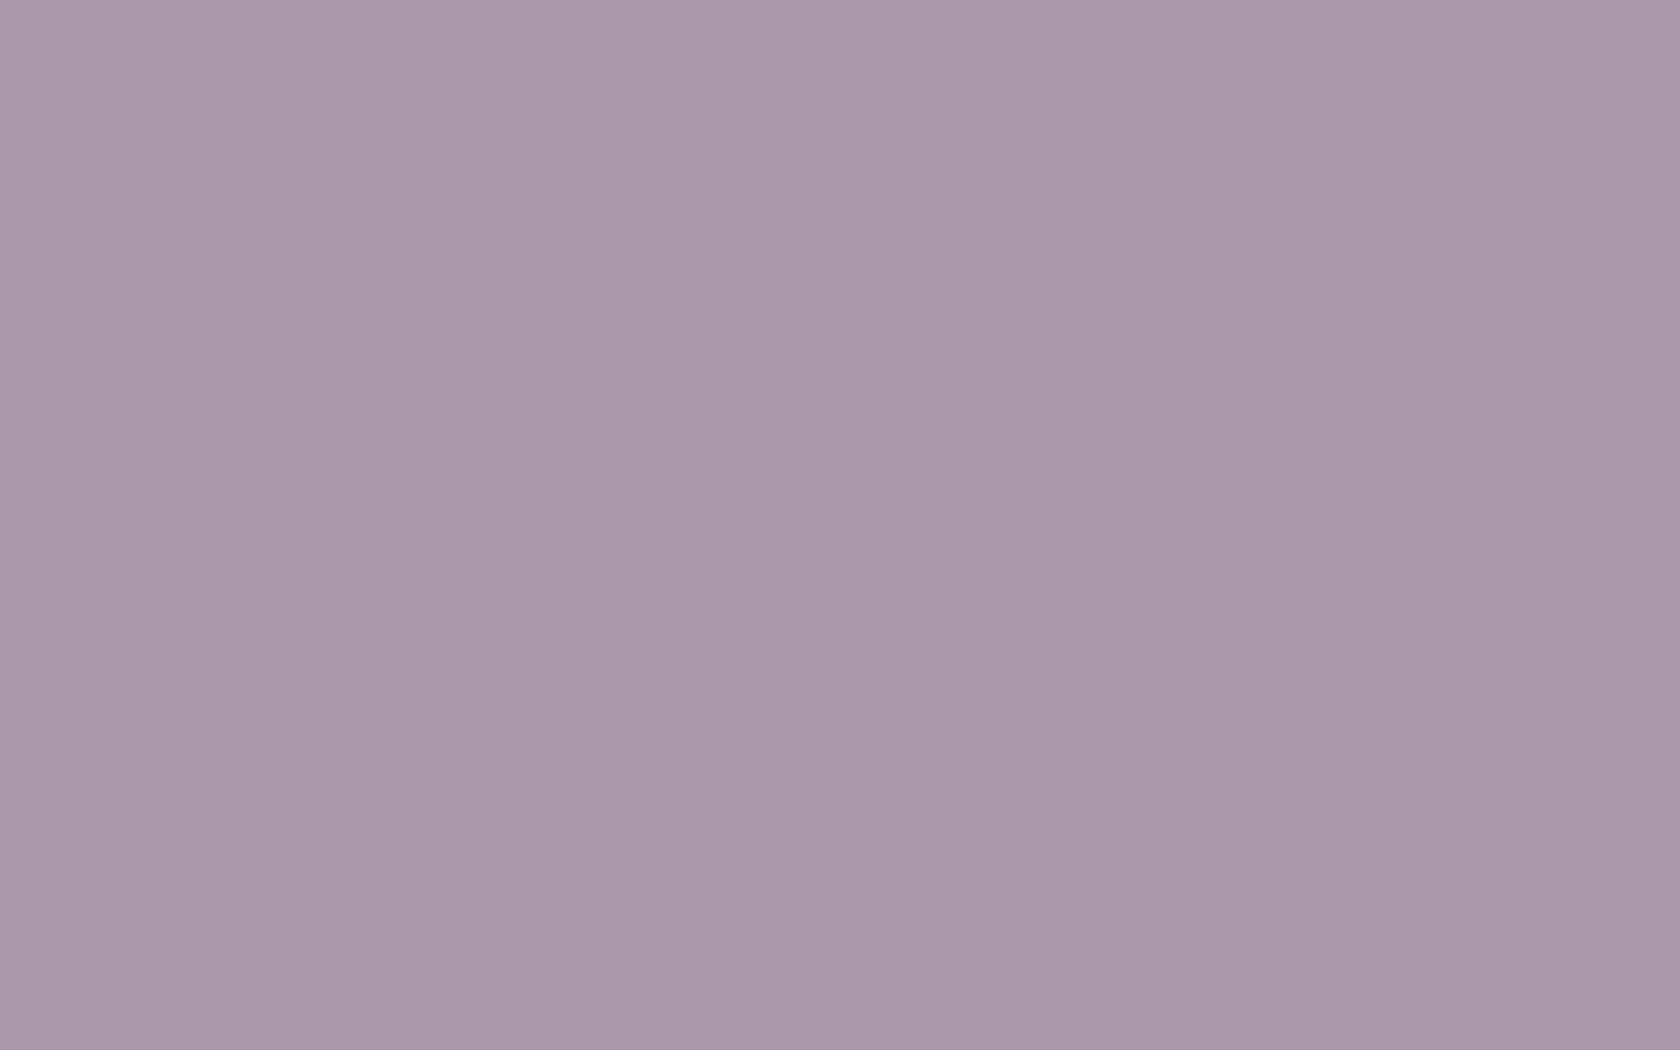 1680x1050 Rose Quartz Solid Color Background